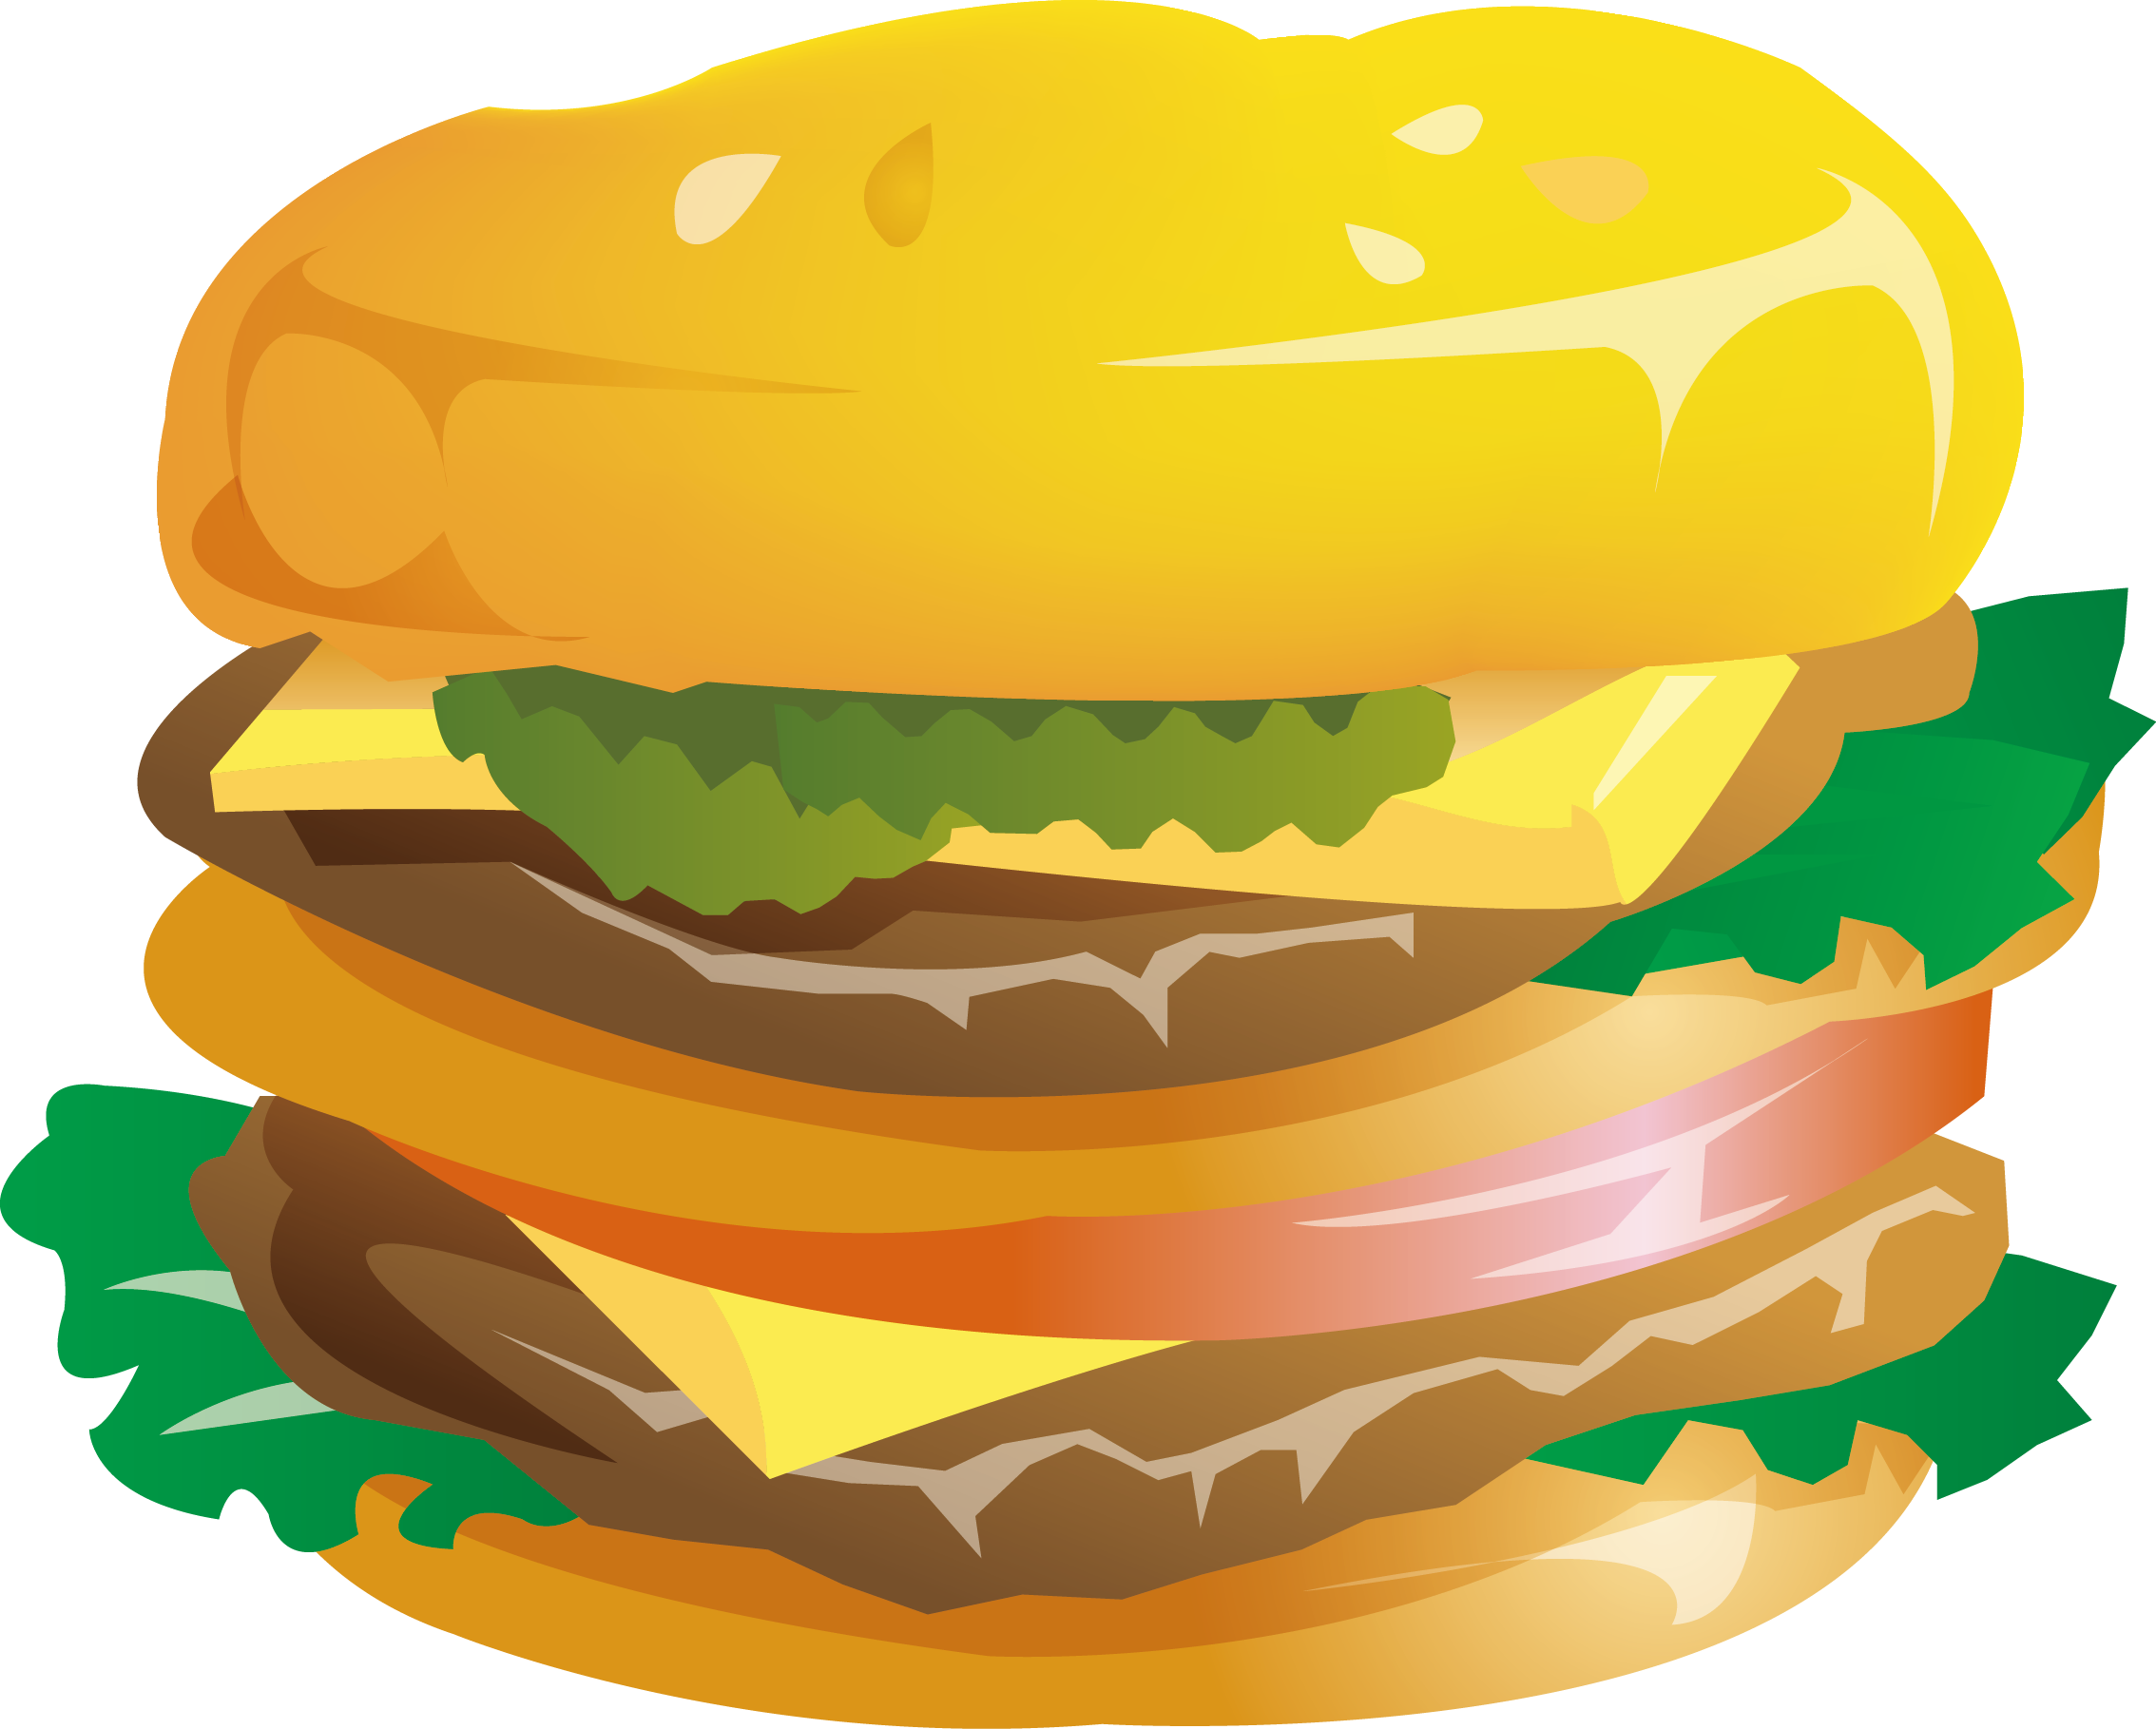 Mcdonalds big mac cheeseburger. Hamburger clipart chicken burger